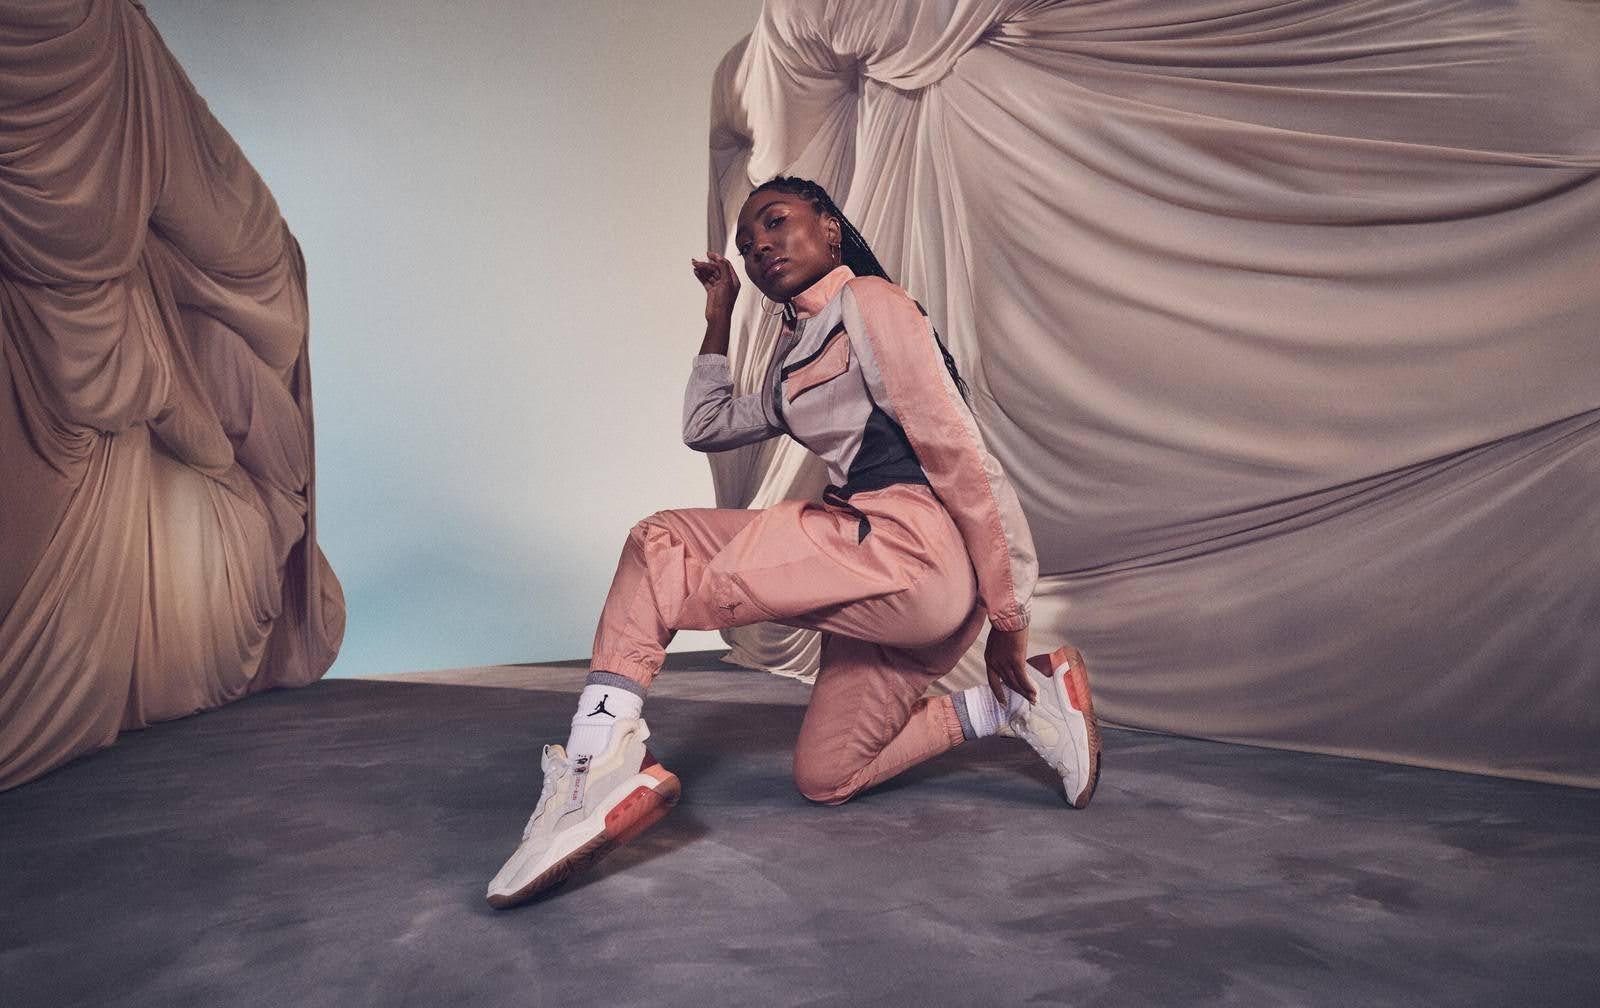 Nike-jordan-brand-ma-2-air-max-200-and-women-s-future-primal-apparel-style-3